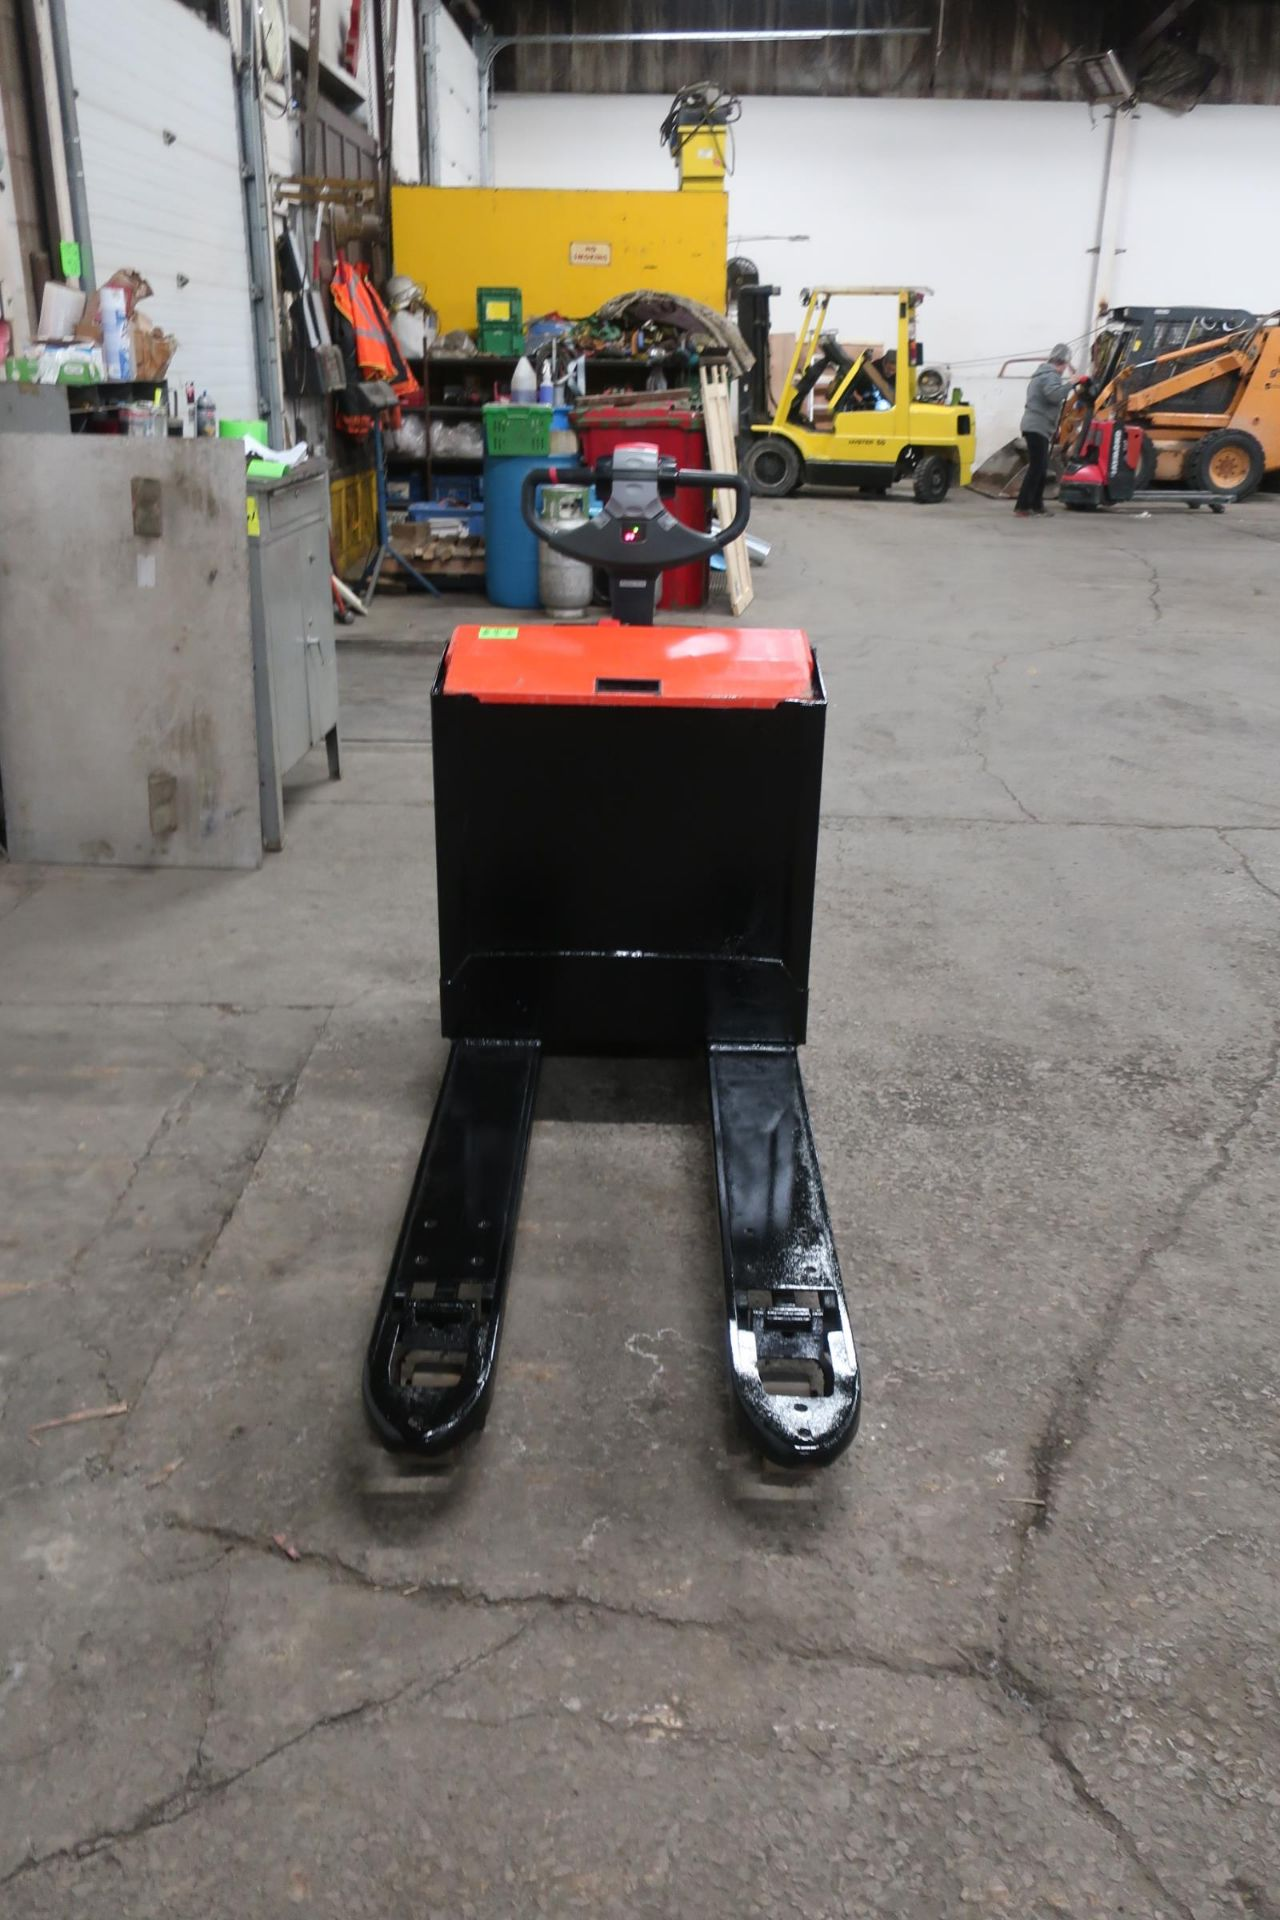 BT Raymond Walk Behind Electric Powered Pallet Cart Walkie Lift 5000lbs capacity - Image 2 of 2